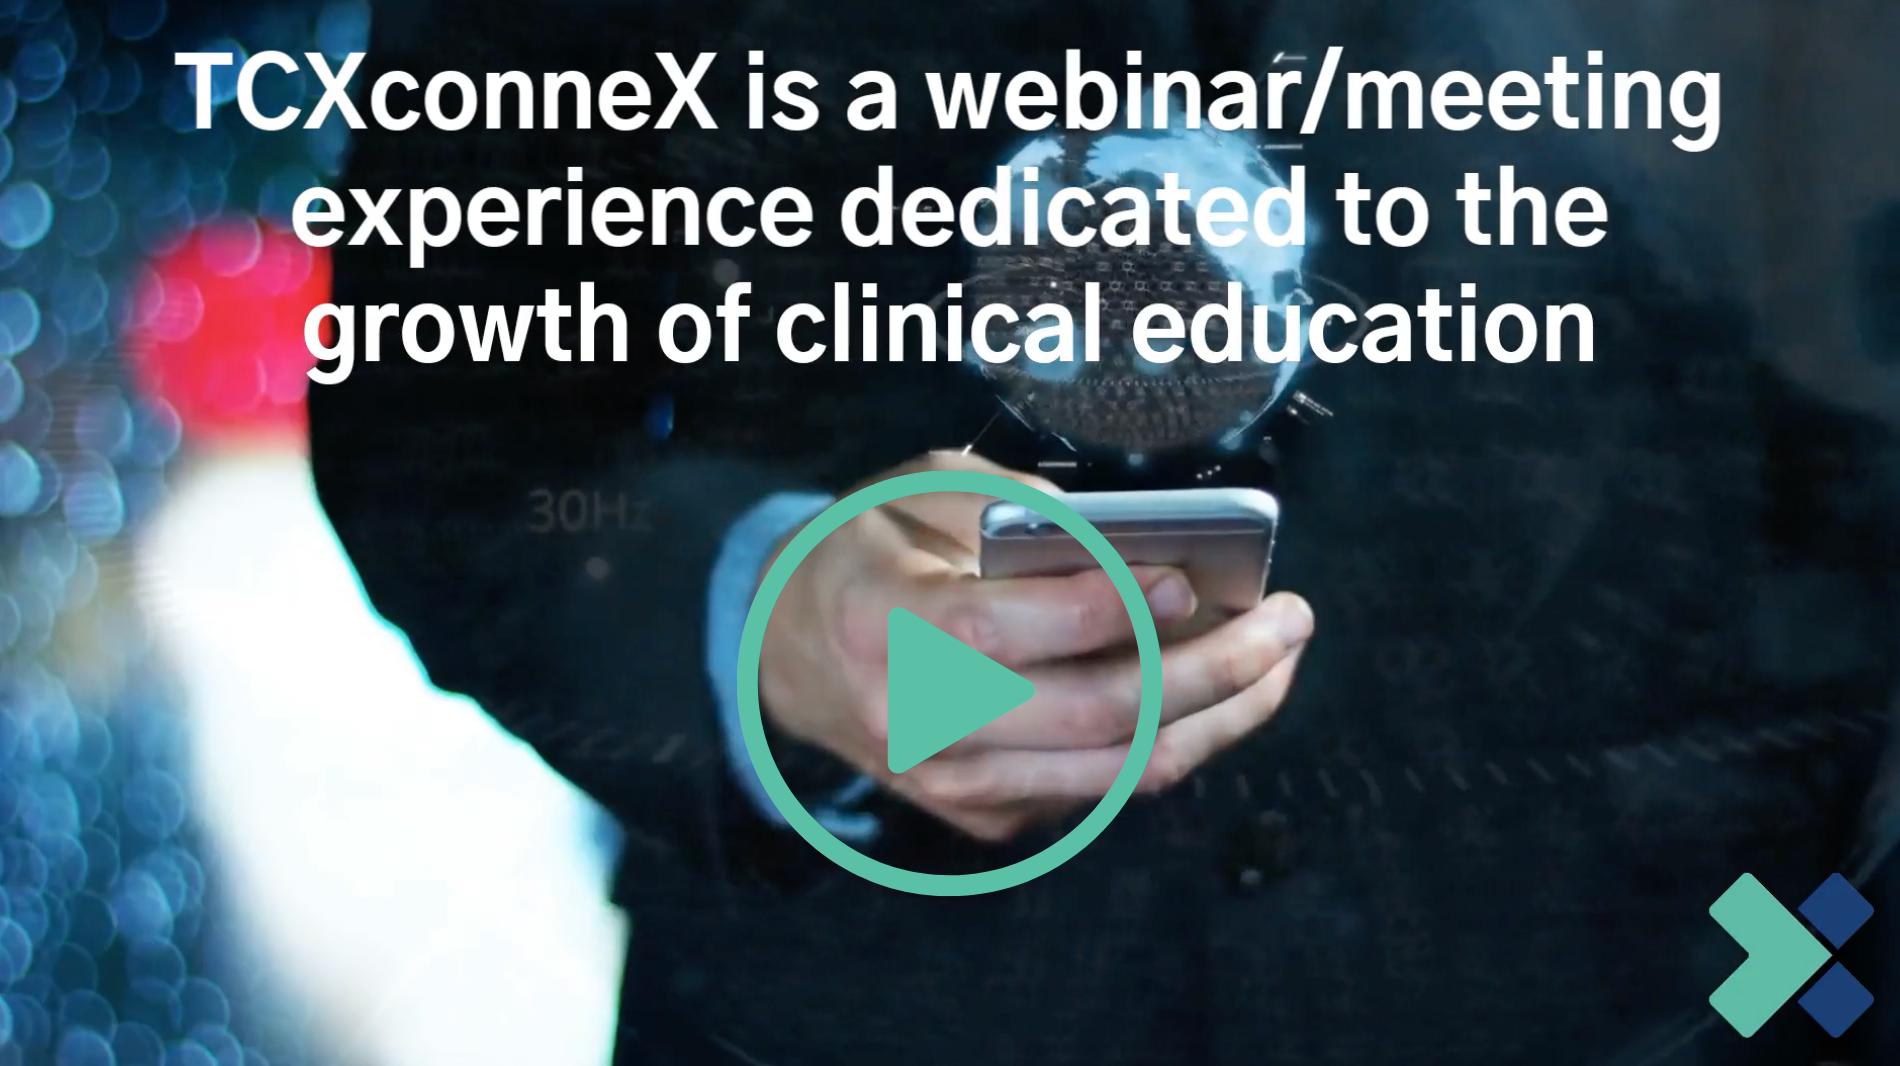 Tcxconnex video